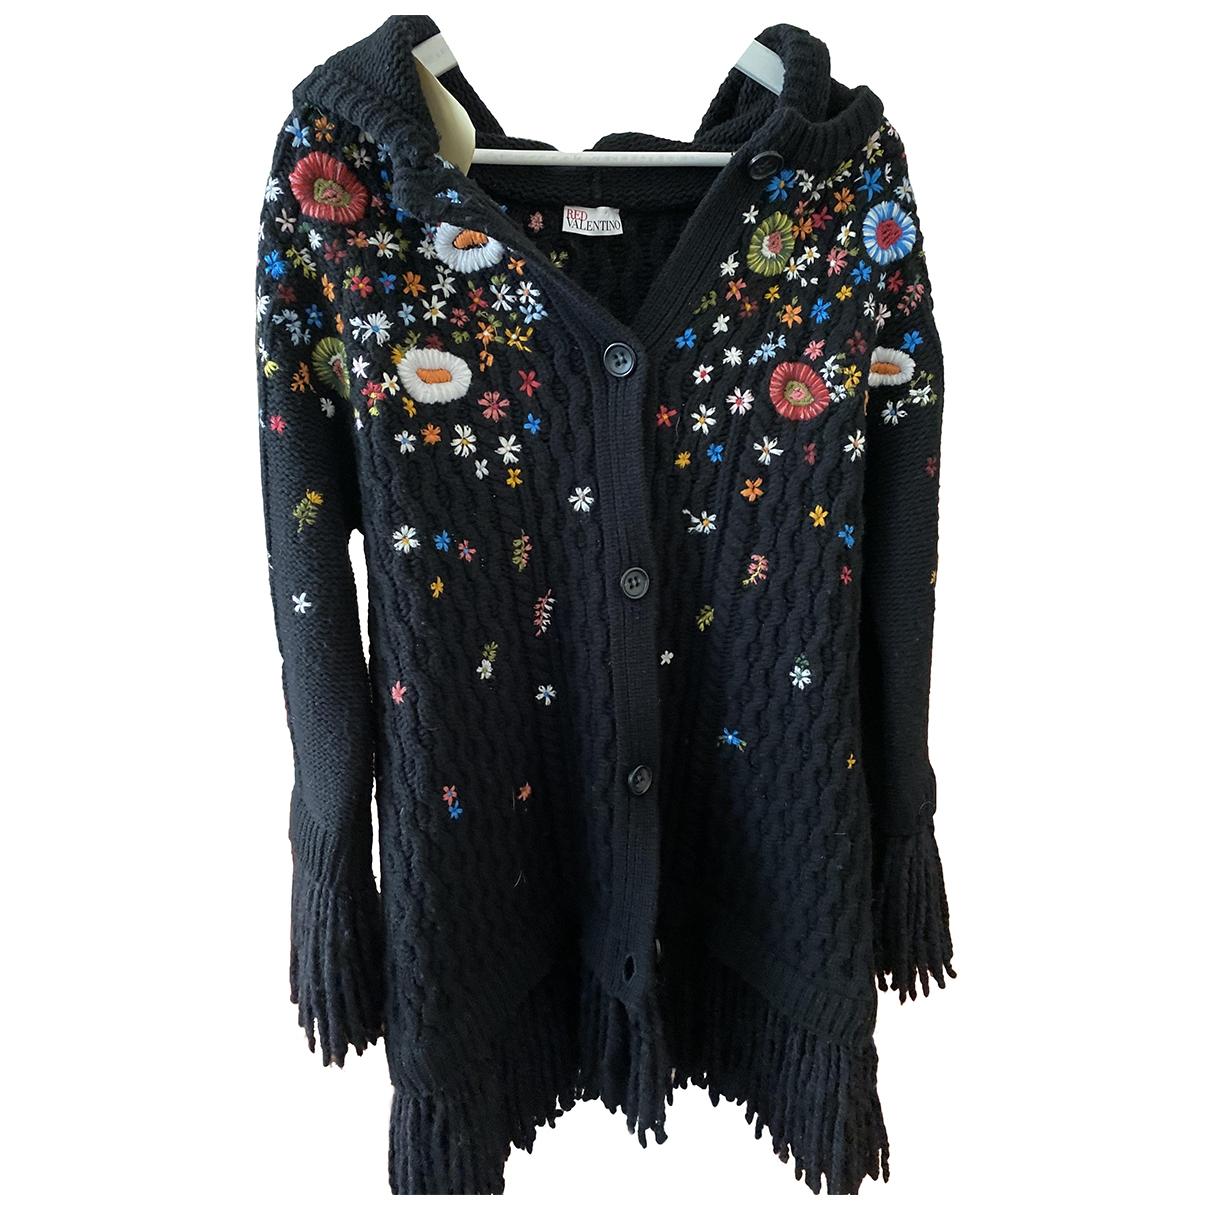 Red Valentino Garavani \N Black Wool coat for Women XS International